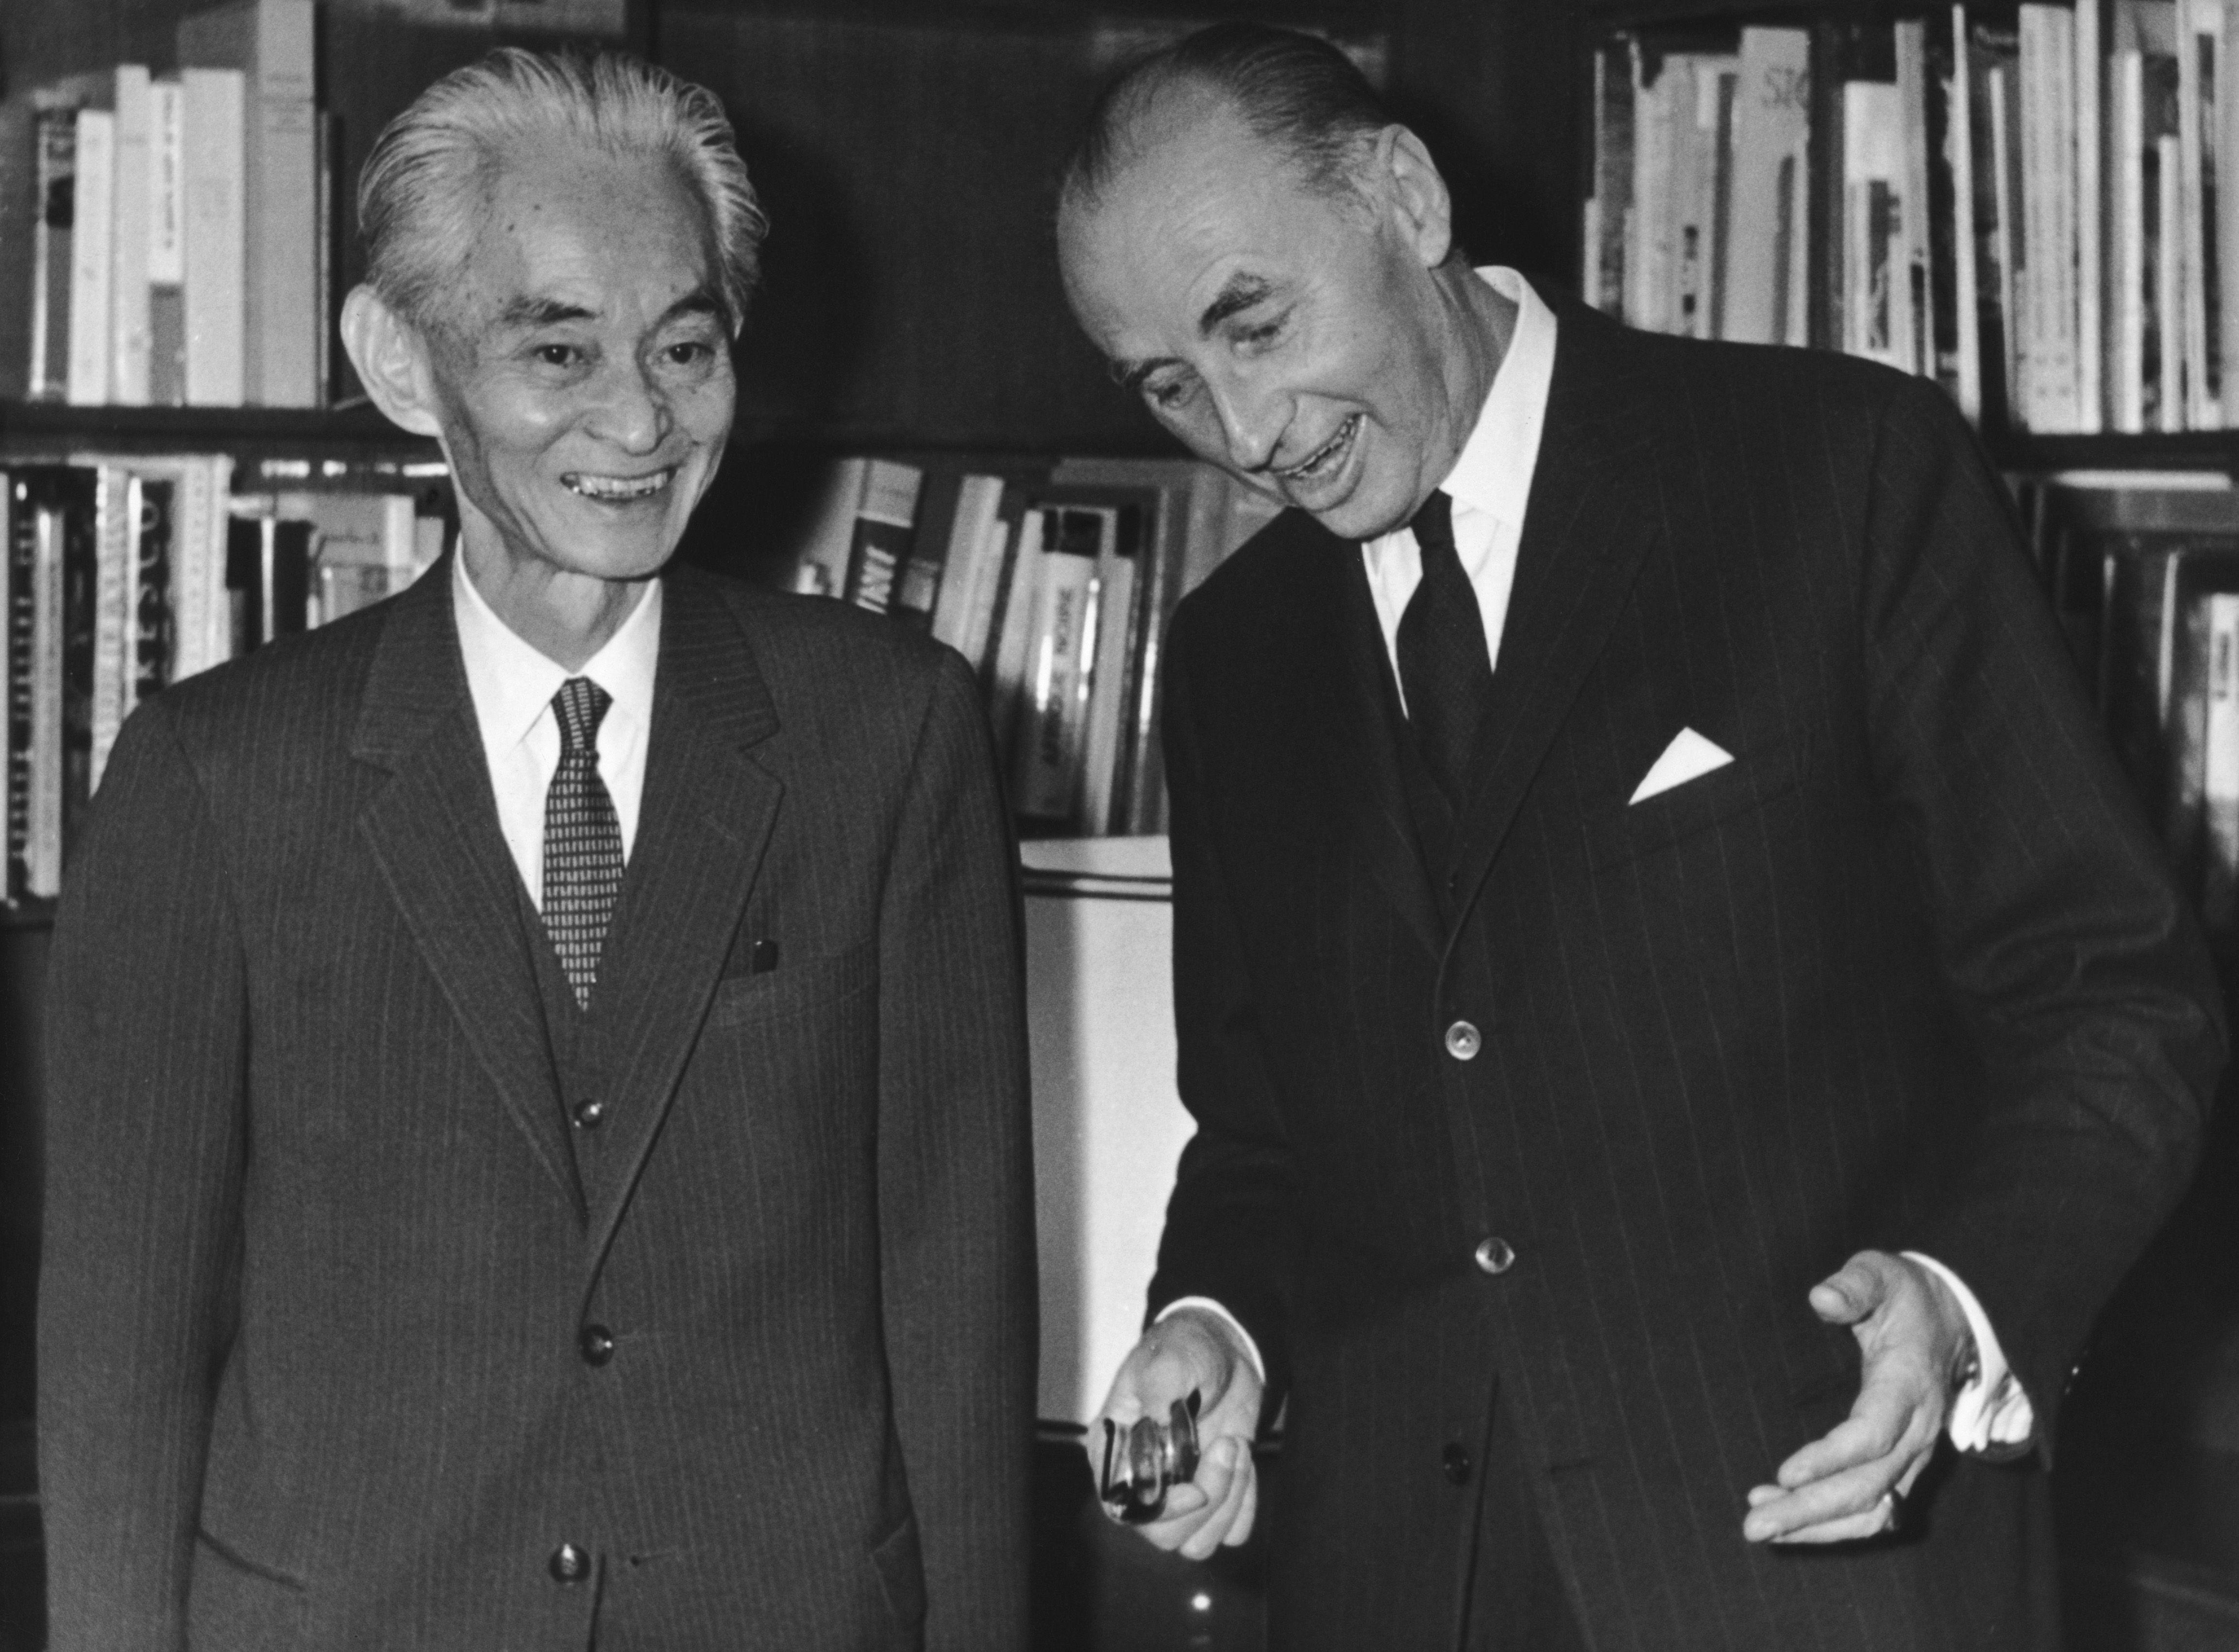 Rene Maheu (1905 - 1975, right), Director-General of UNESCO, welcomes Japanese author Yasunari Kawabata (1899 - 1972), winner of that year's Nobel Prize for Literature, to Paris, 18th December 1968